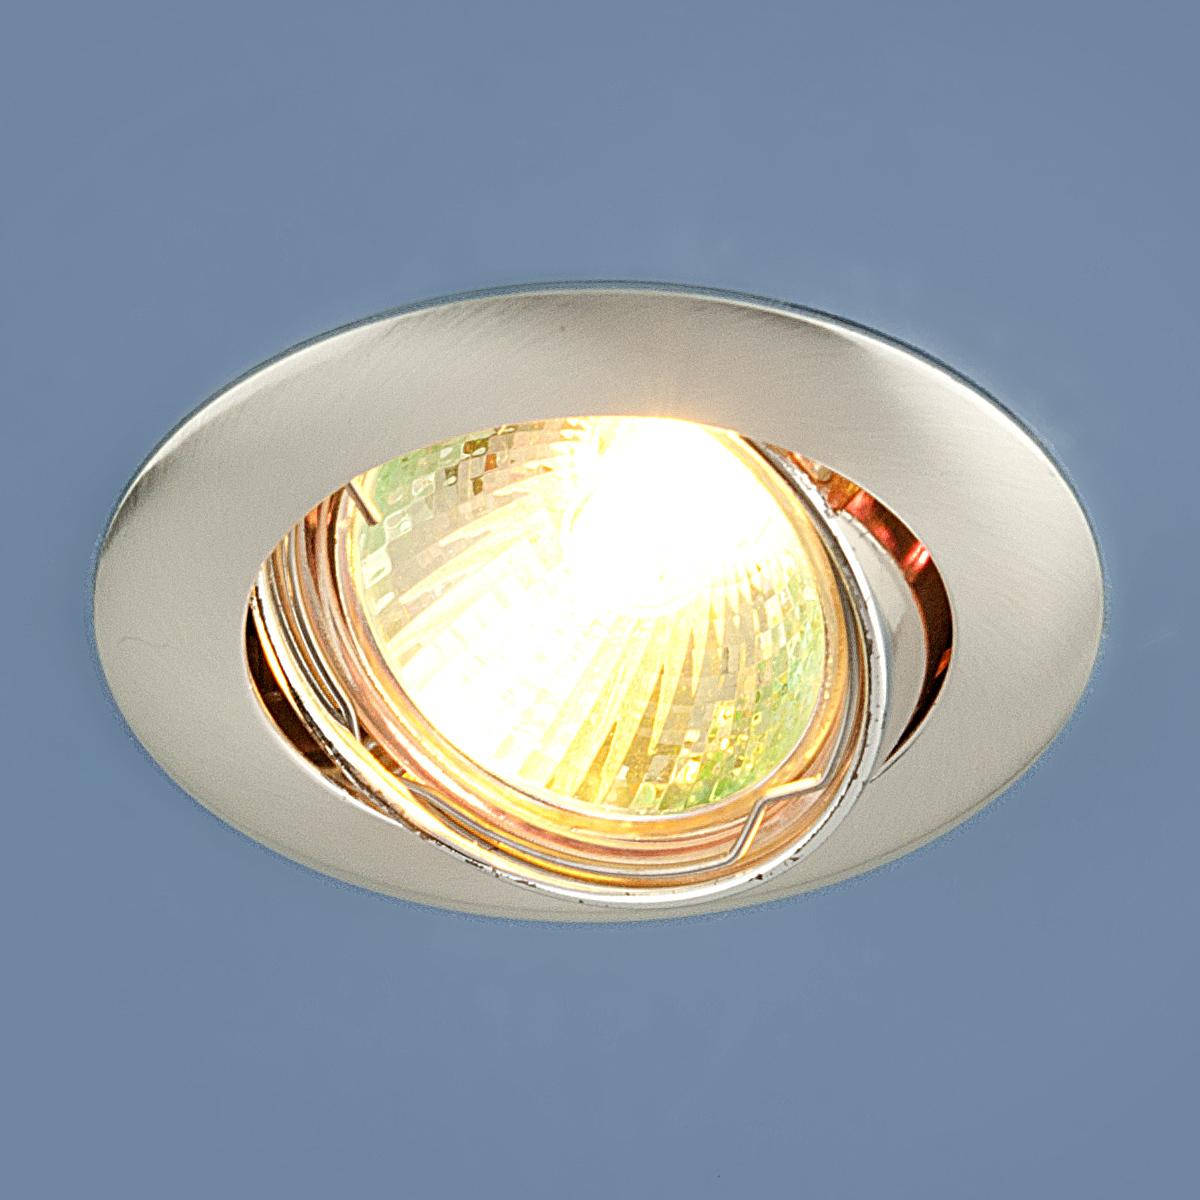 Встраиваемый светильник Elektrostandard Точечный 104S MR16 SS, G5.3 bfgoodrich all terrain t a ko2 lt30 9 5 r15 104s 245 80 r15 104s